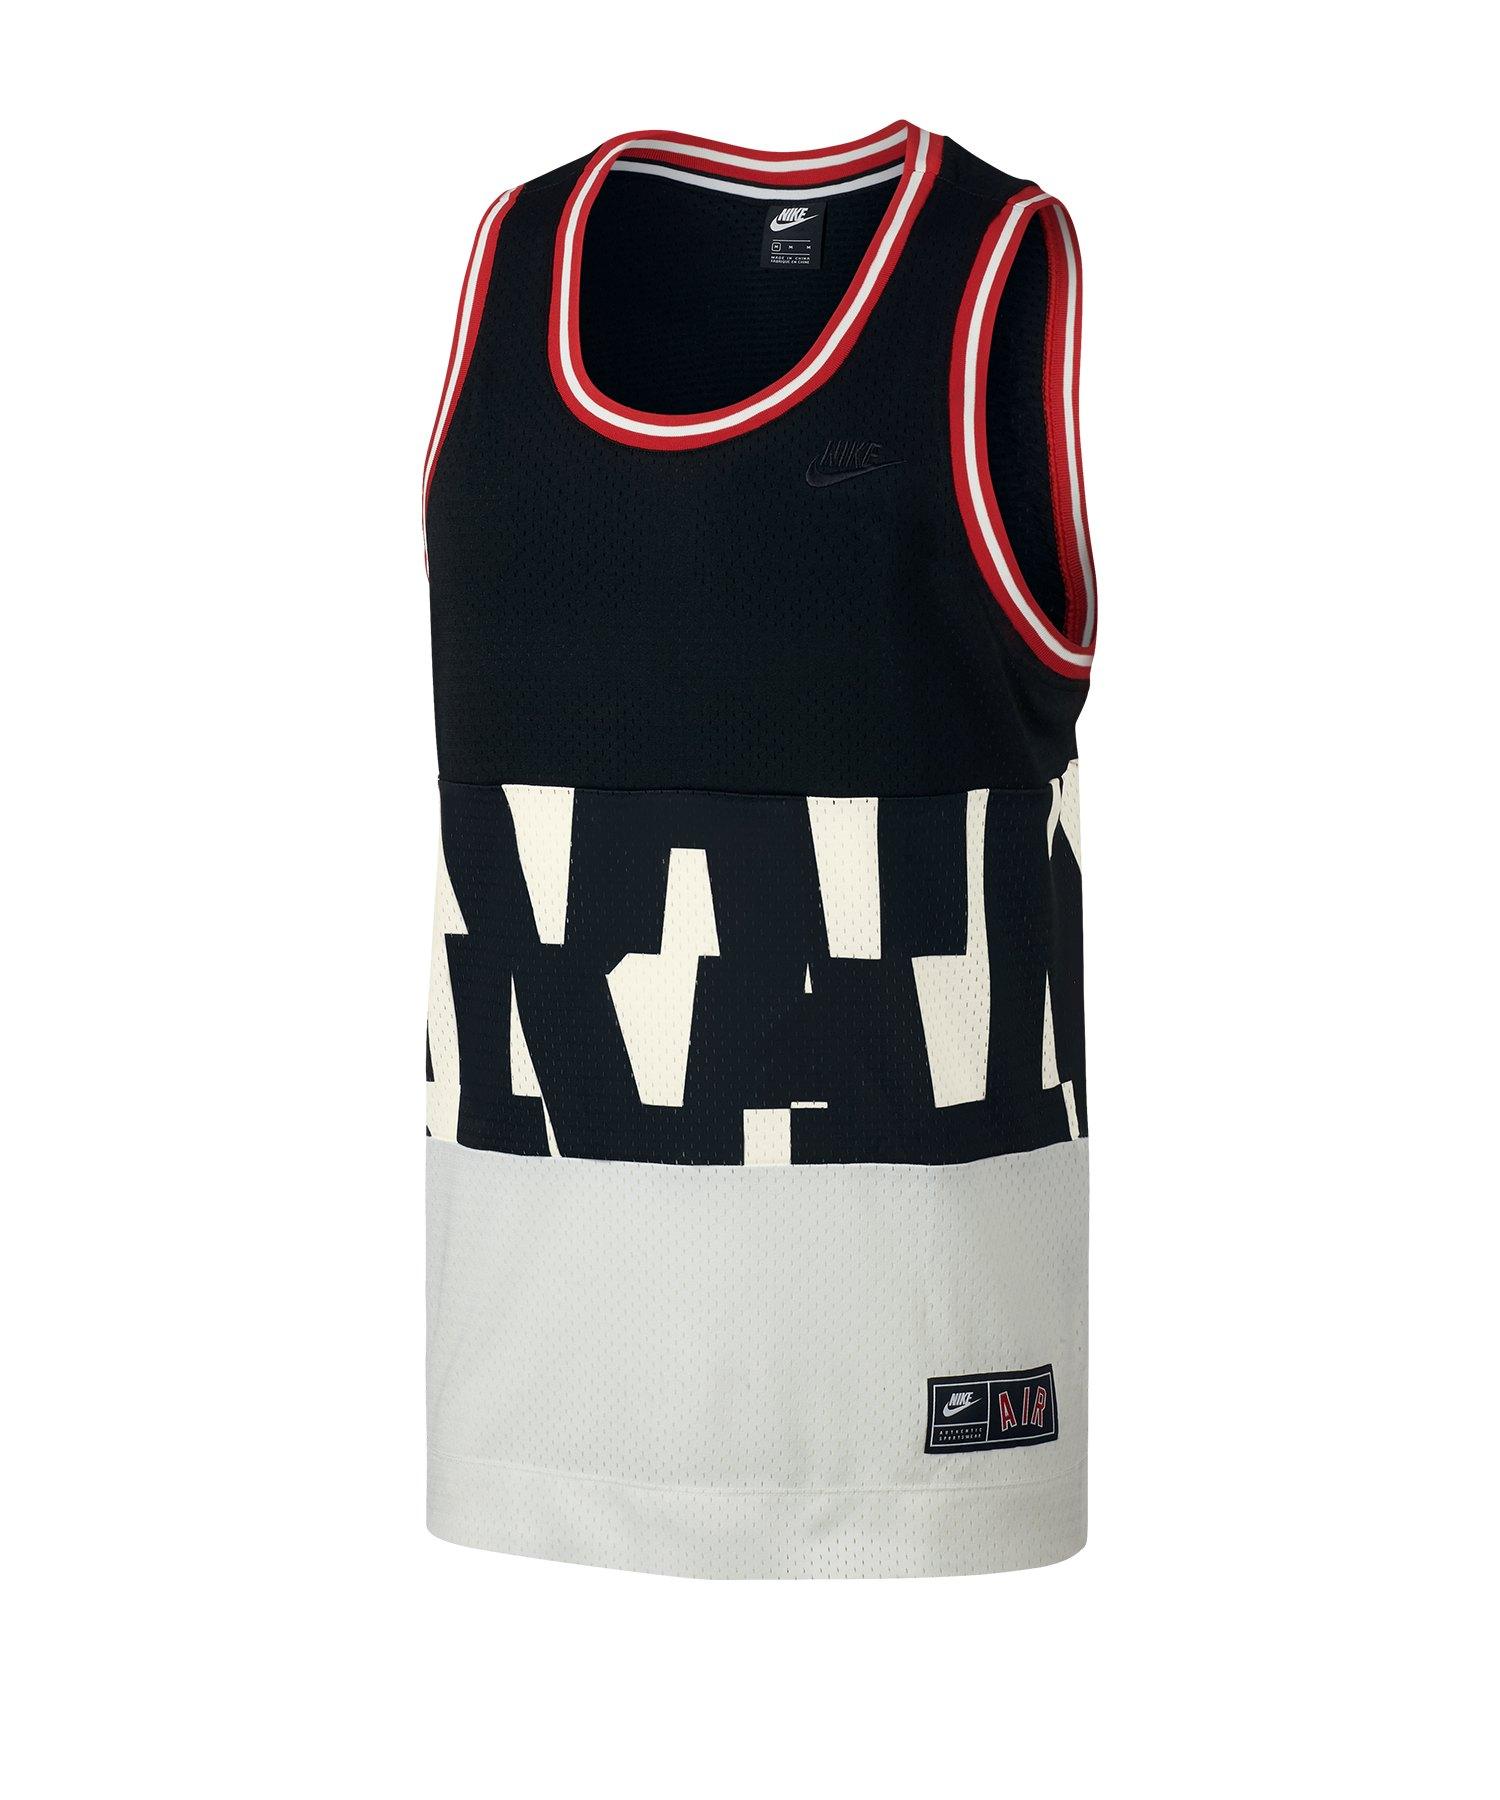 Nike Air Mesh Tank Top Schwarz Weiss Rot F010 - Schwarz